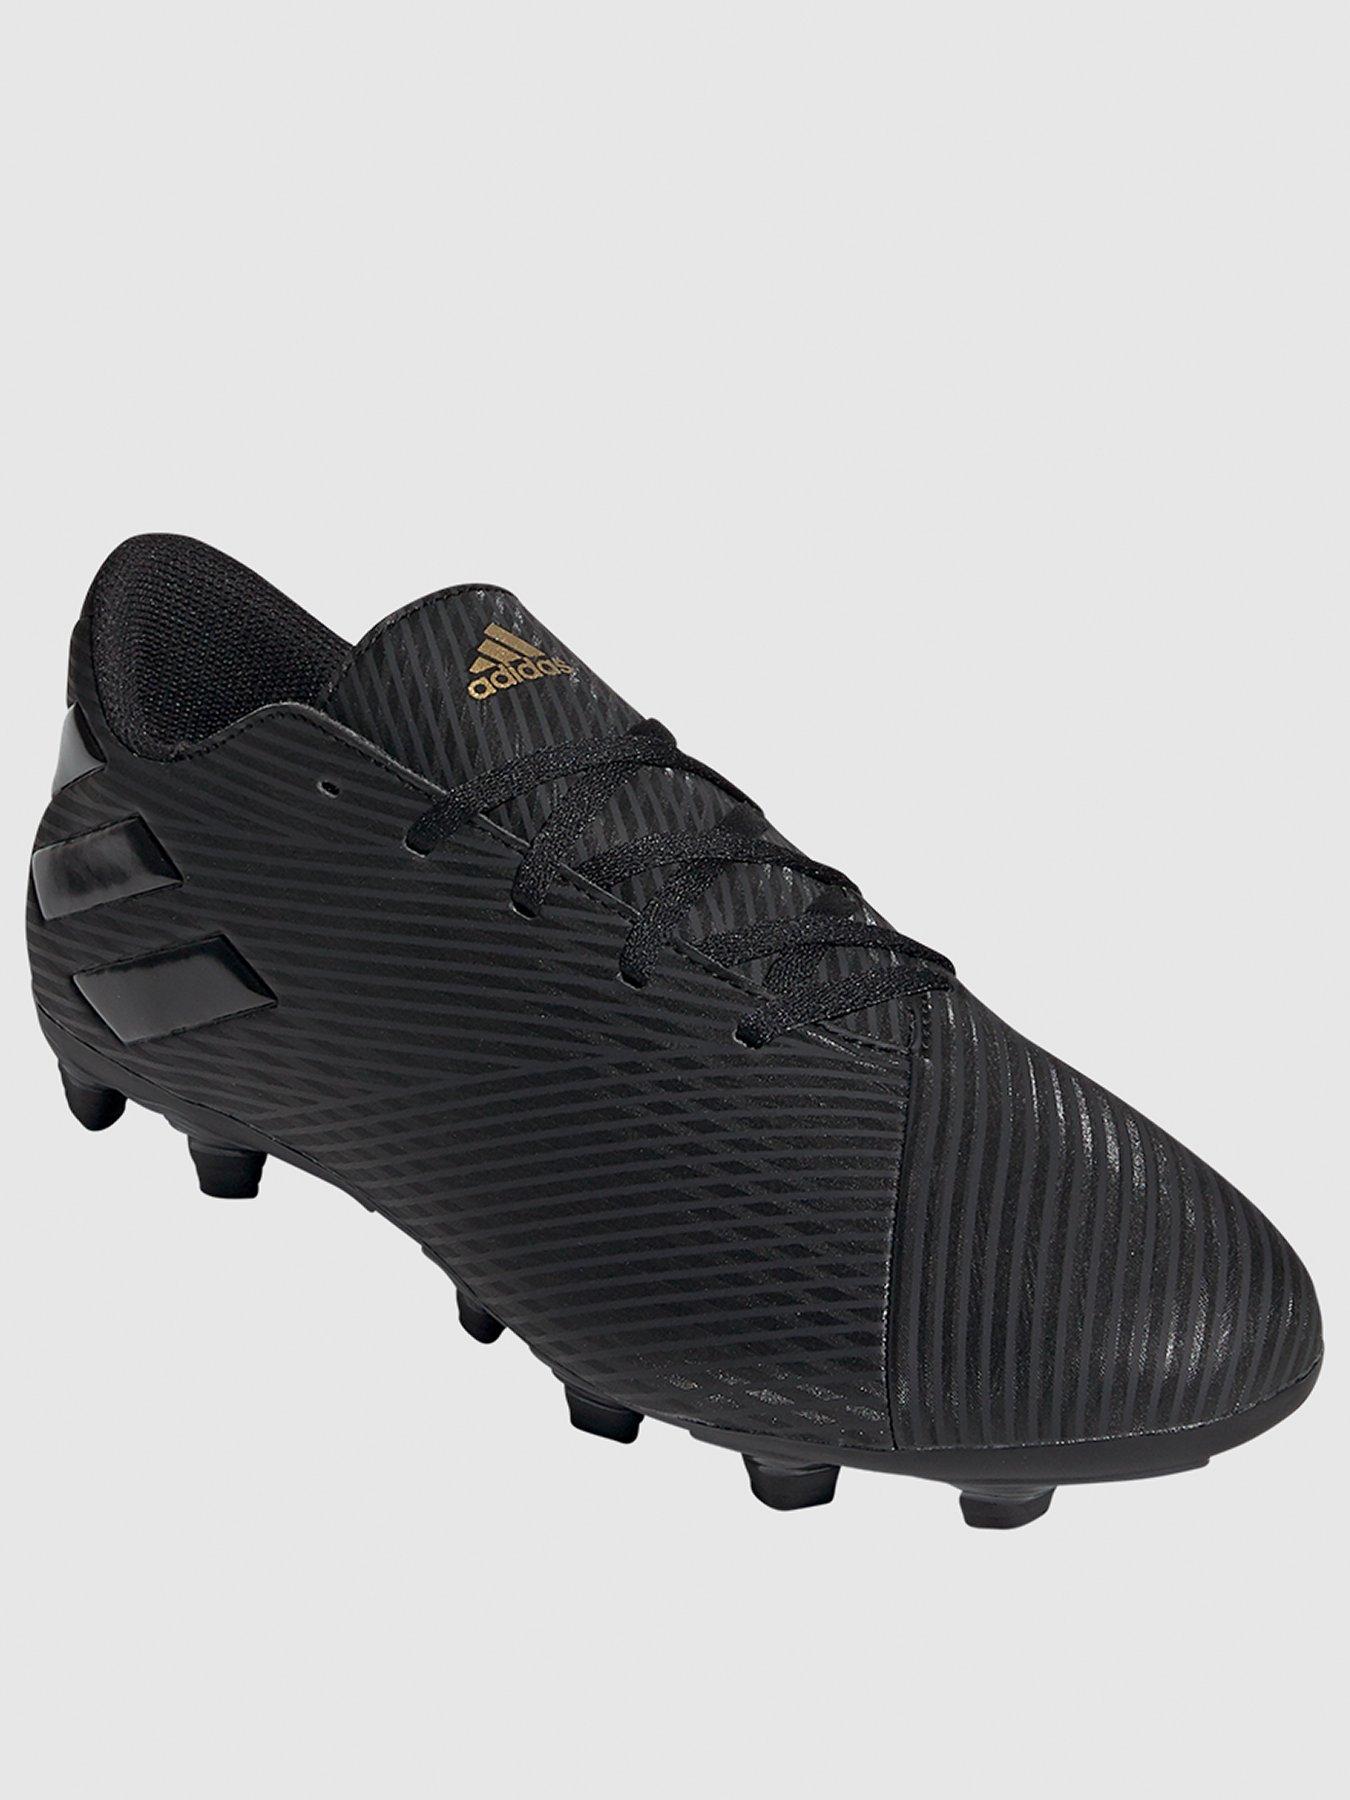 Adidas | Football boots | Mens sports